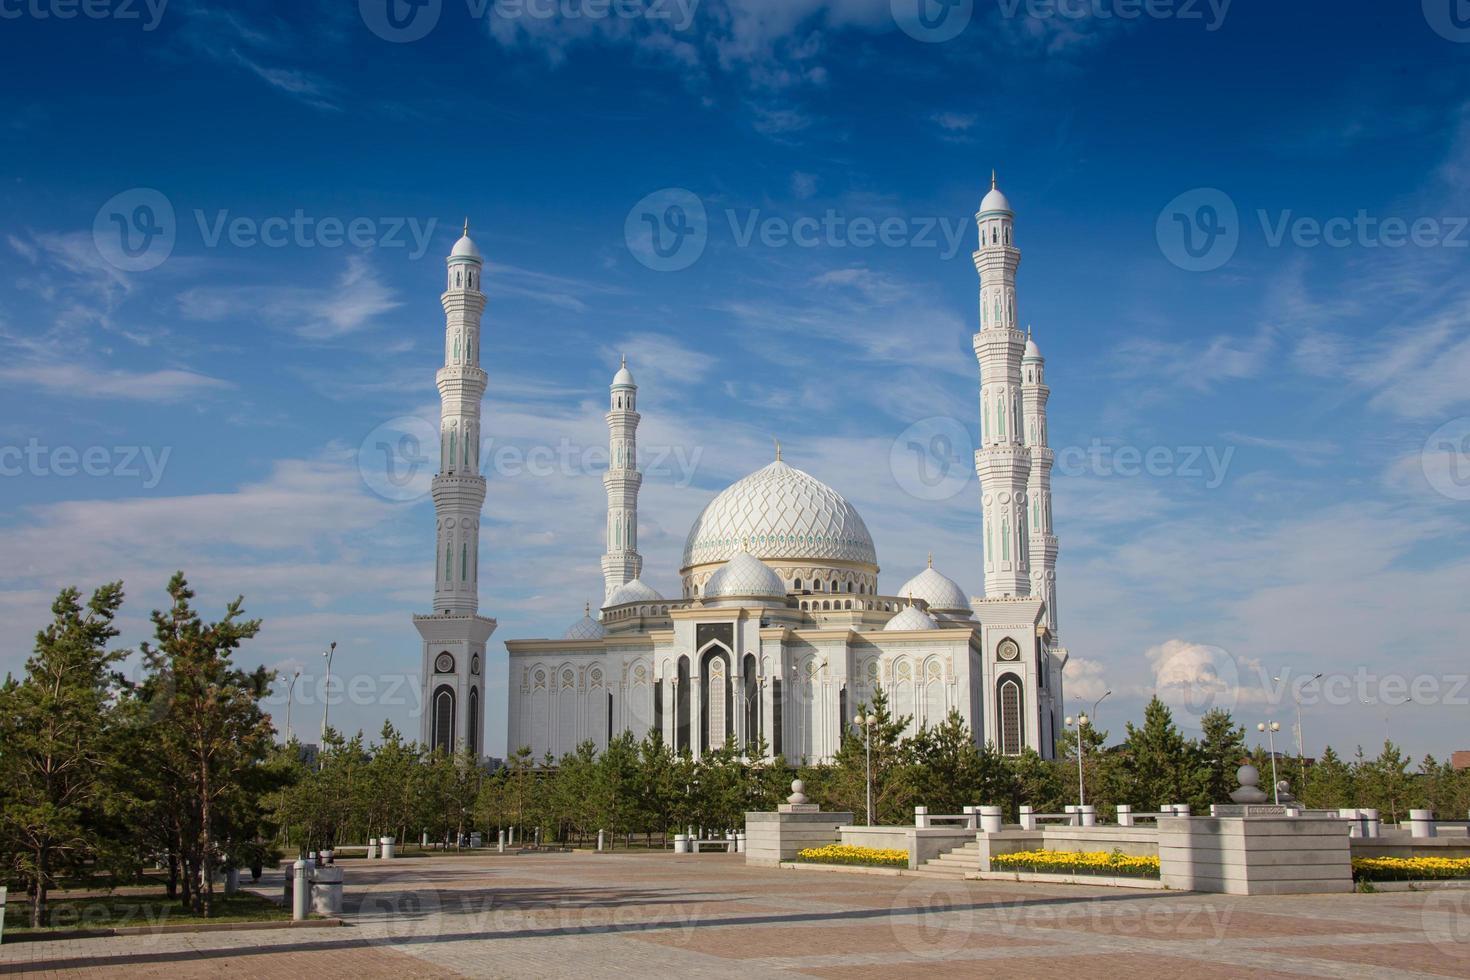 yeni cami-moskee in astsana, kazachstan foto